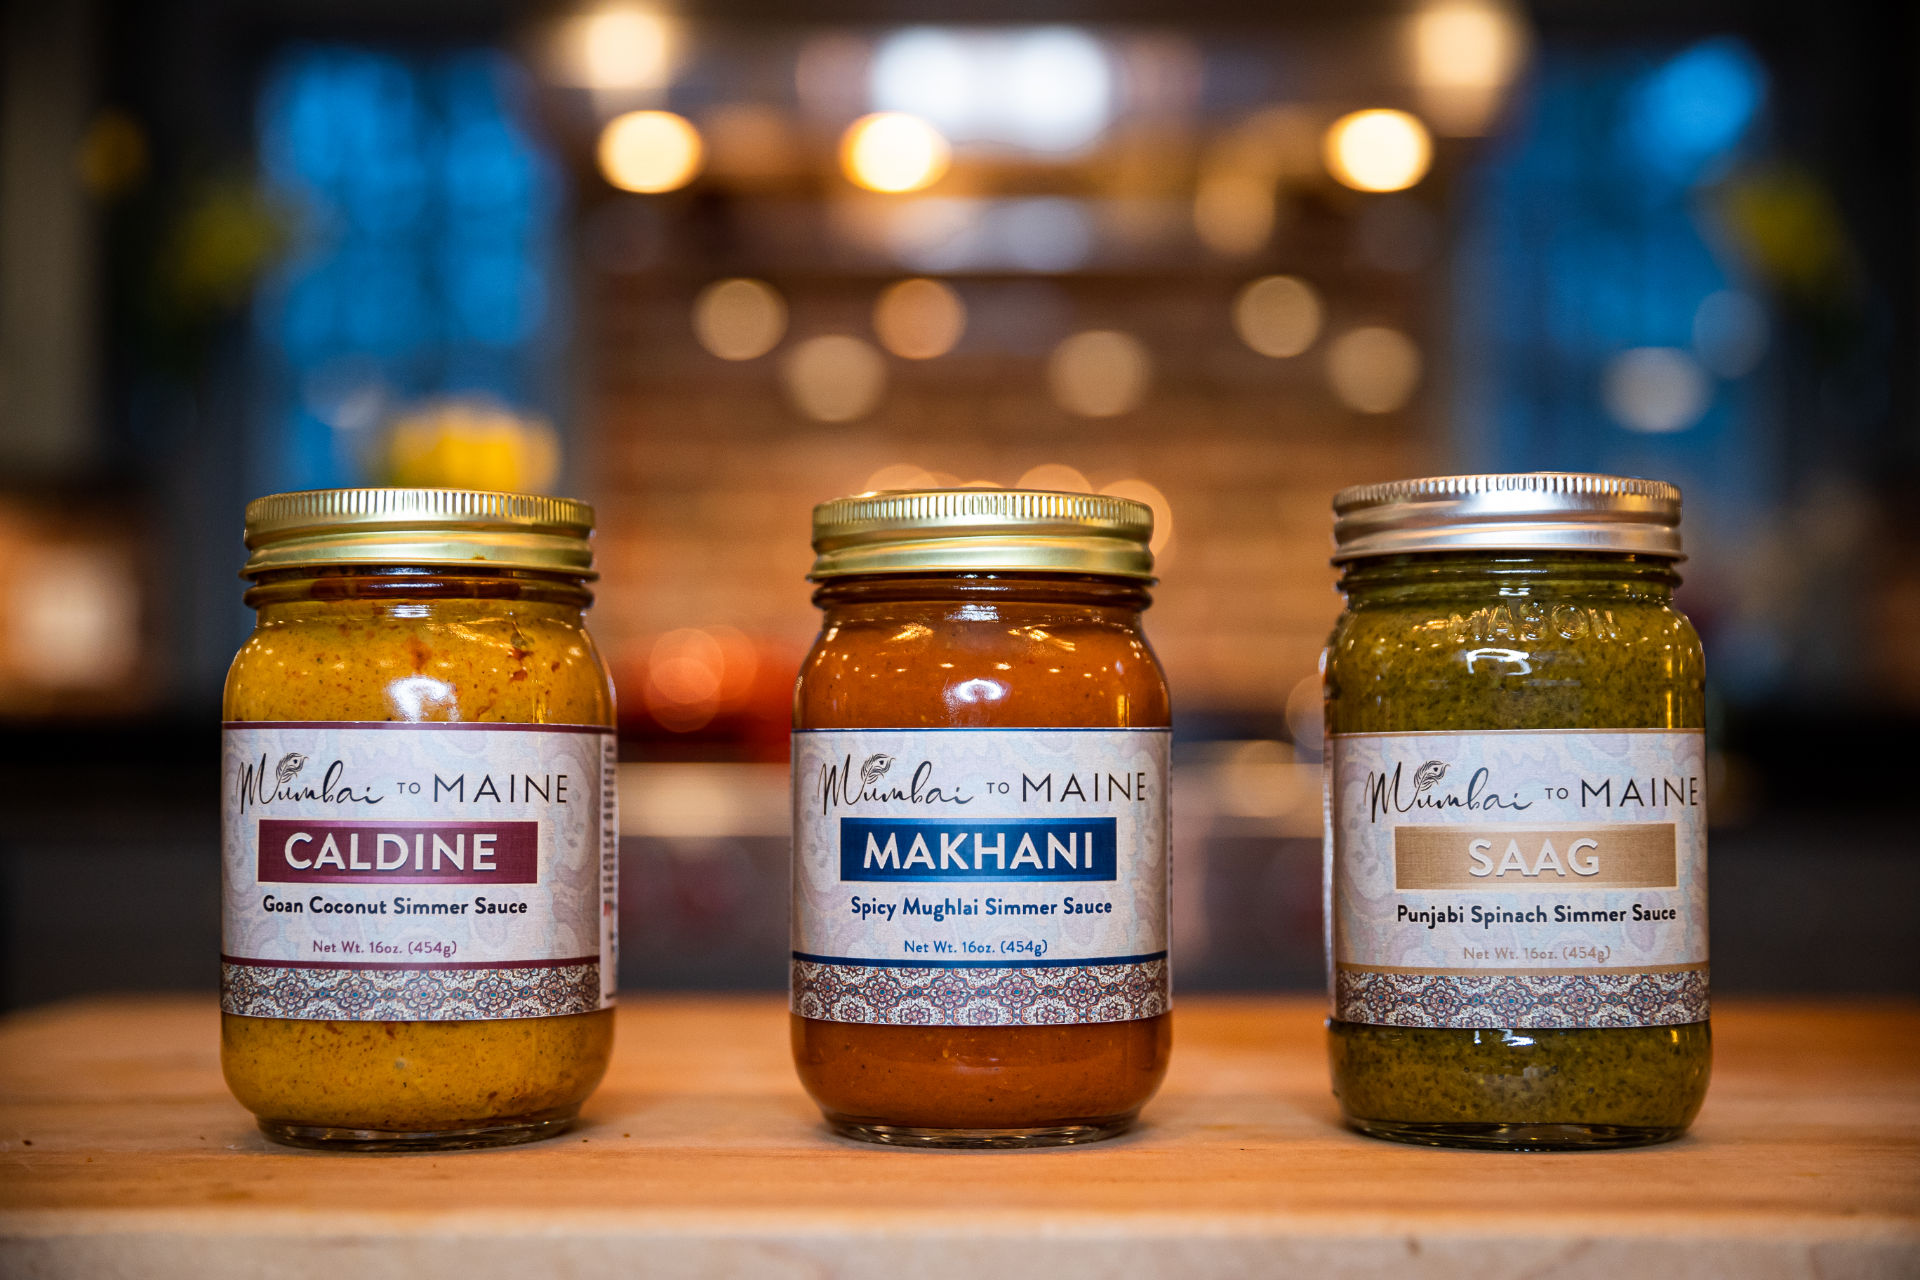 Mumbai to Maine Signature Simmer Sauces - Caldine, Makhani and Saag